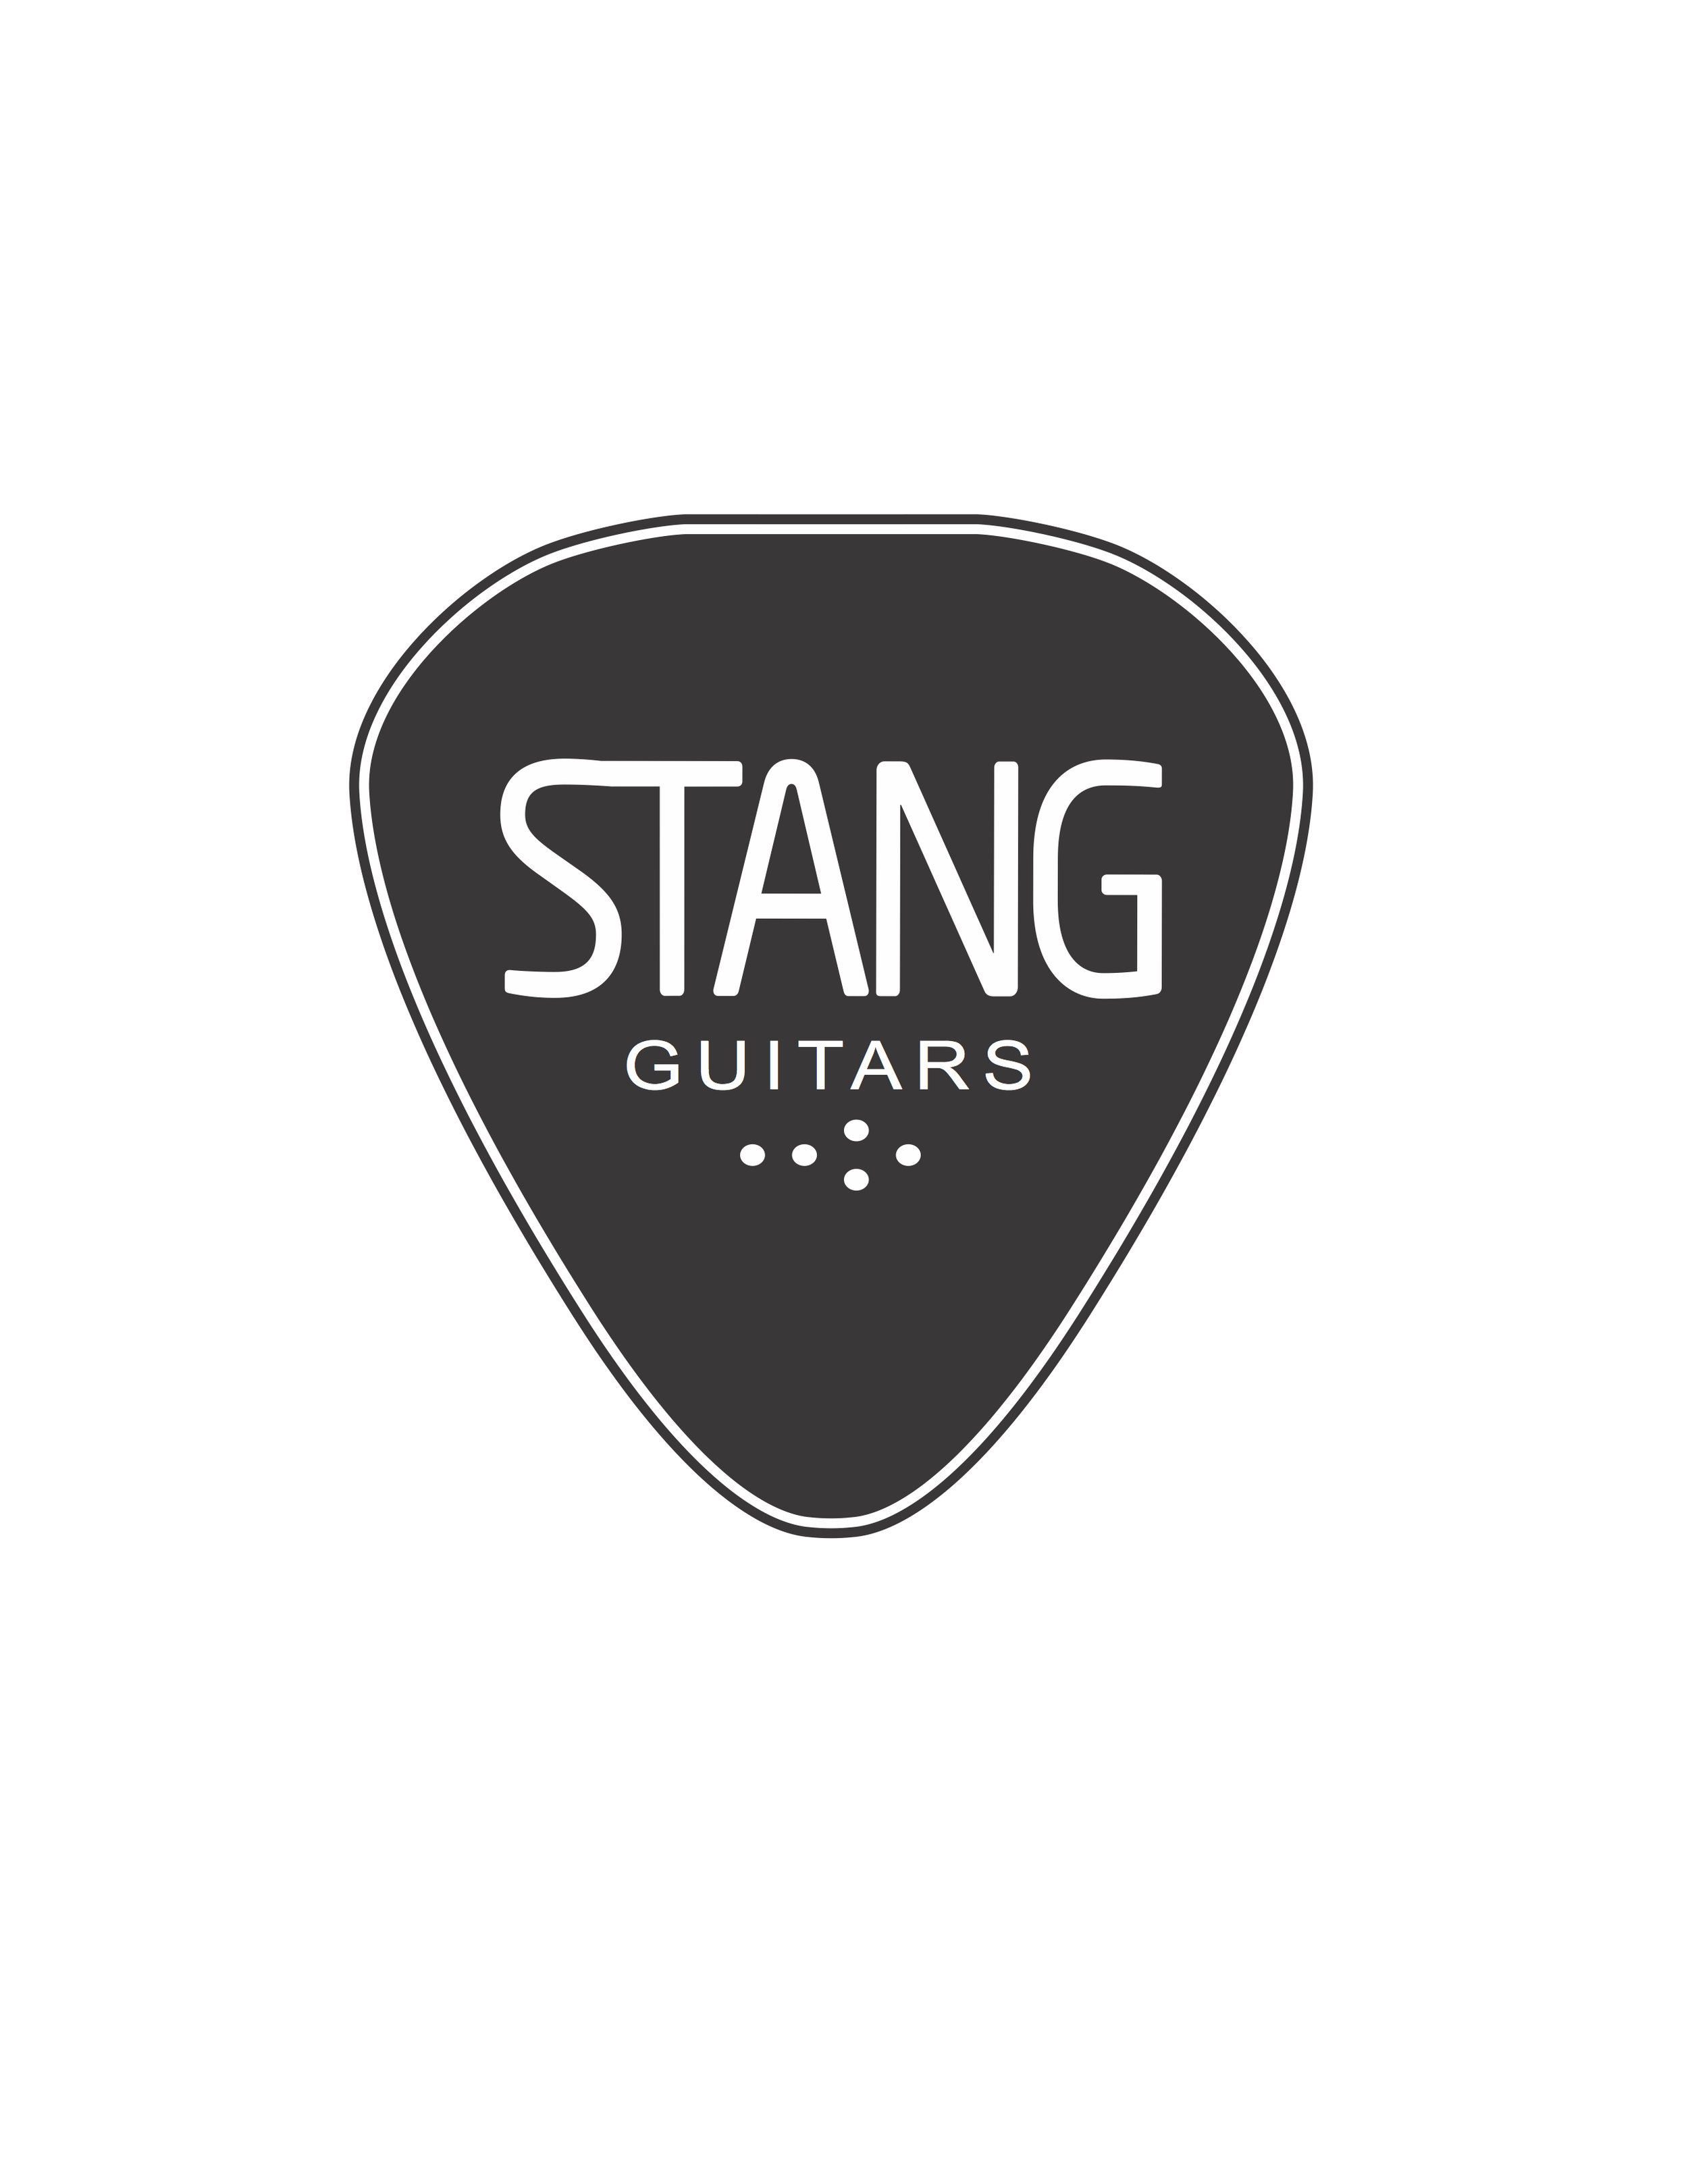 STANG Guitars Final logo.jpg